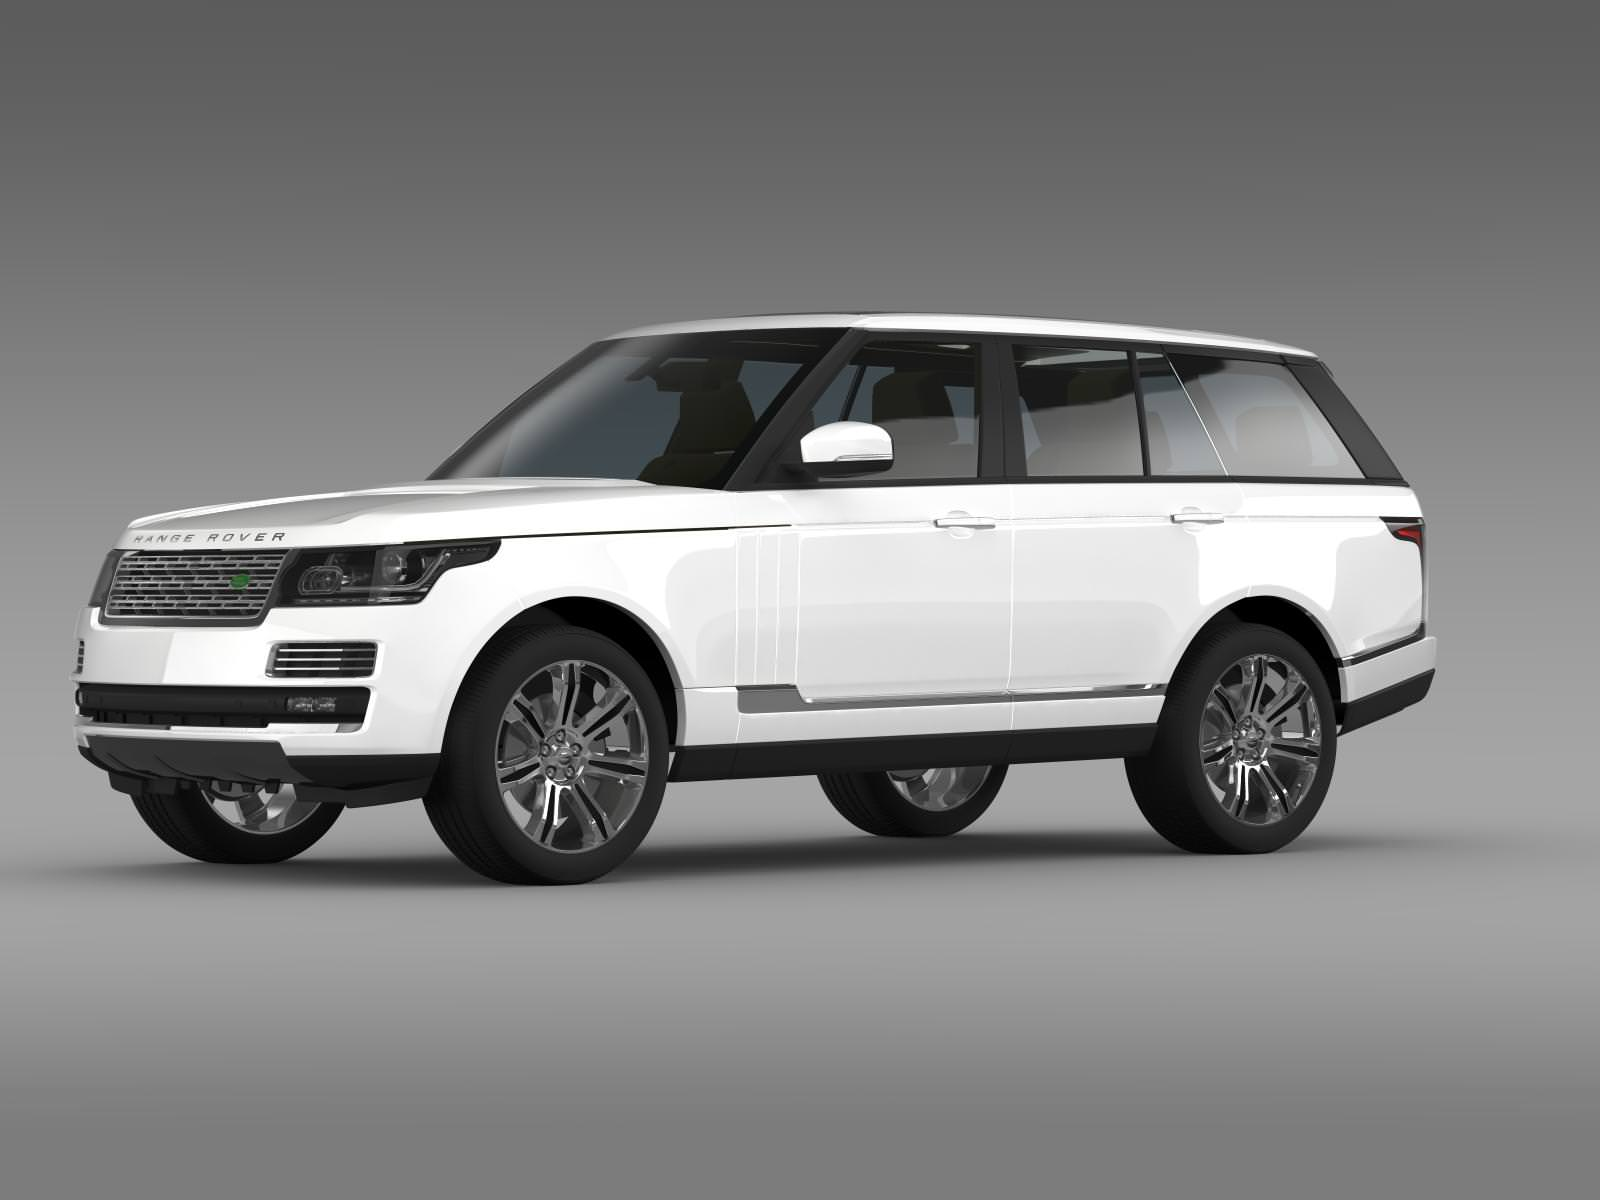 Range Rover Autobiography Black L405 2014 3D model MAX OBJ 3DS FBX